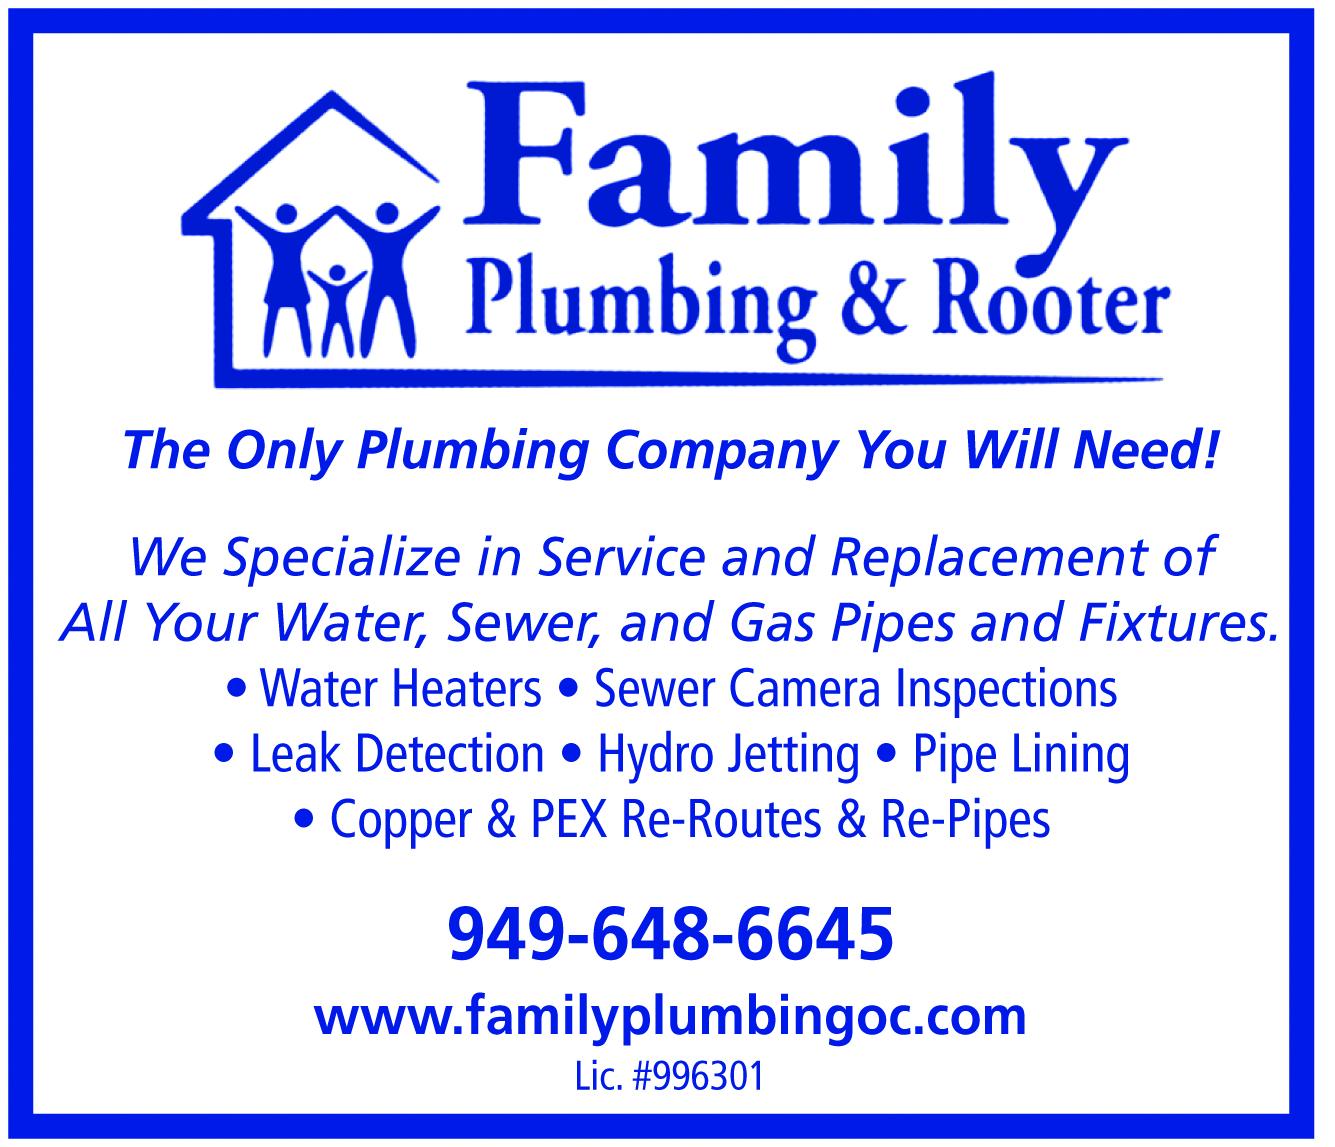 Family Plumbing & Rooter 1835 Newport Blvd, Costa Mesa, CA 92627 ...